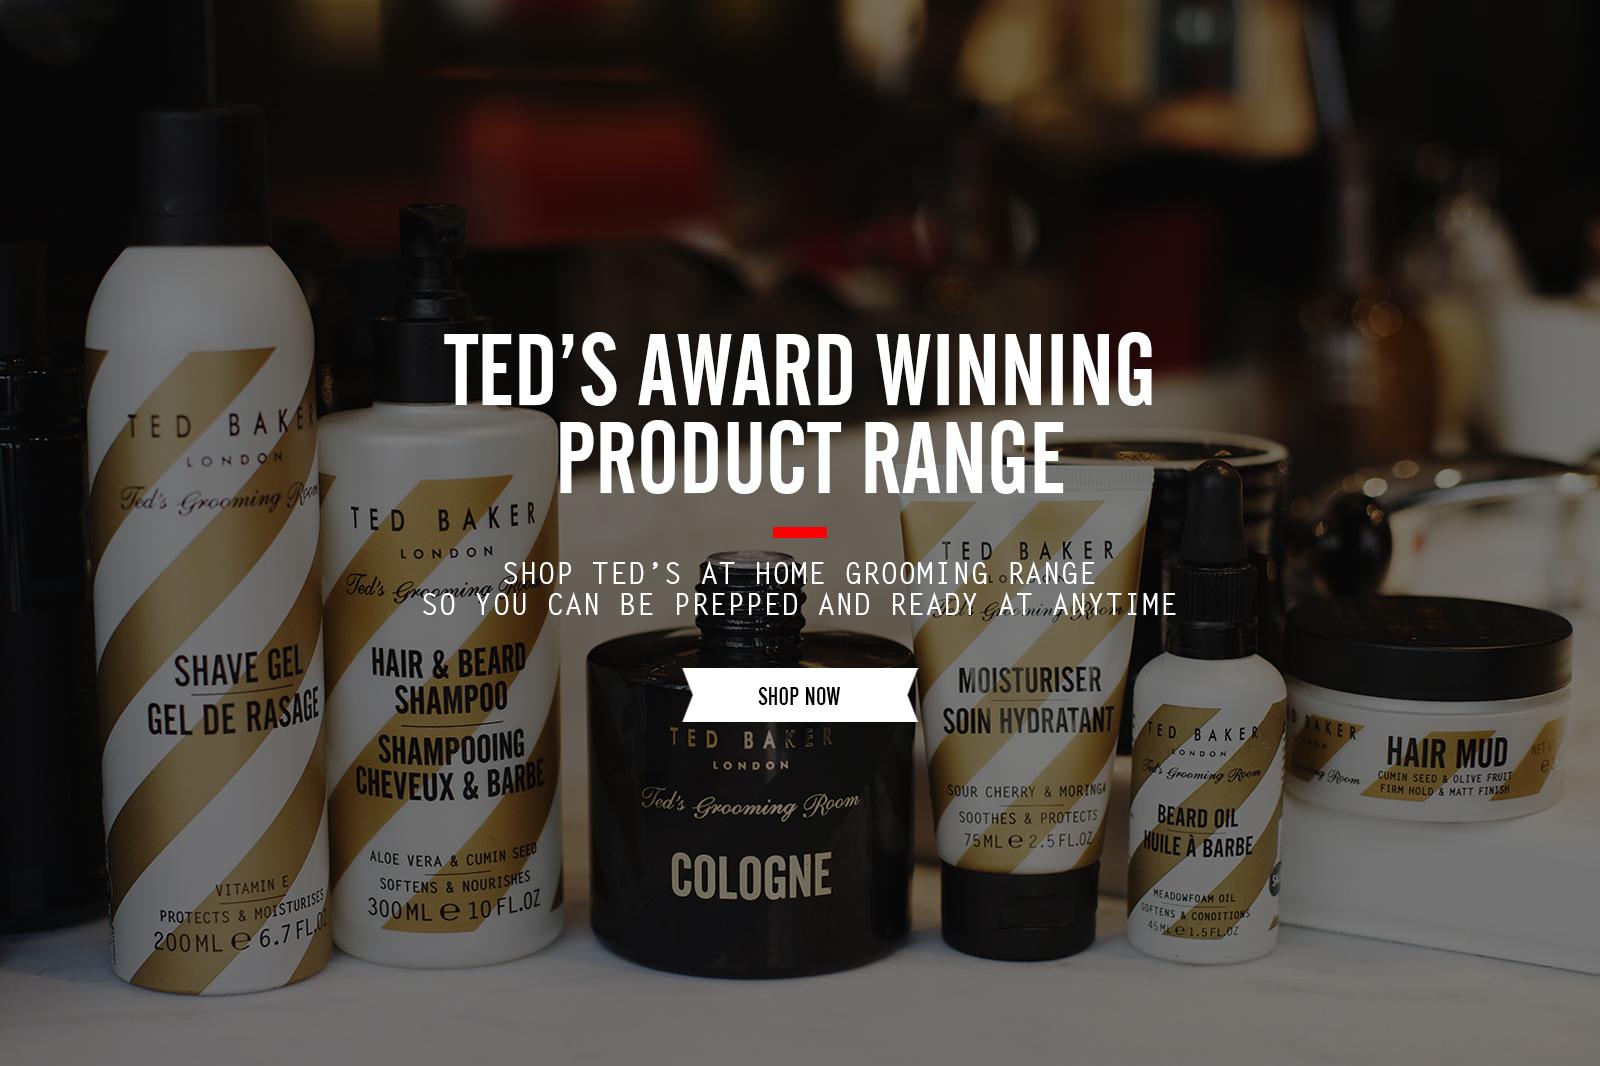 Ted's Award Winning Product Range